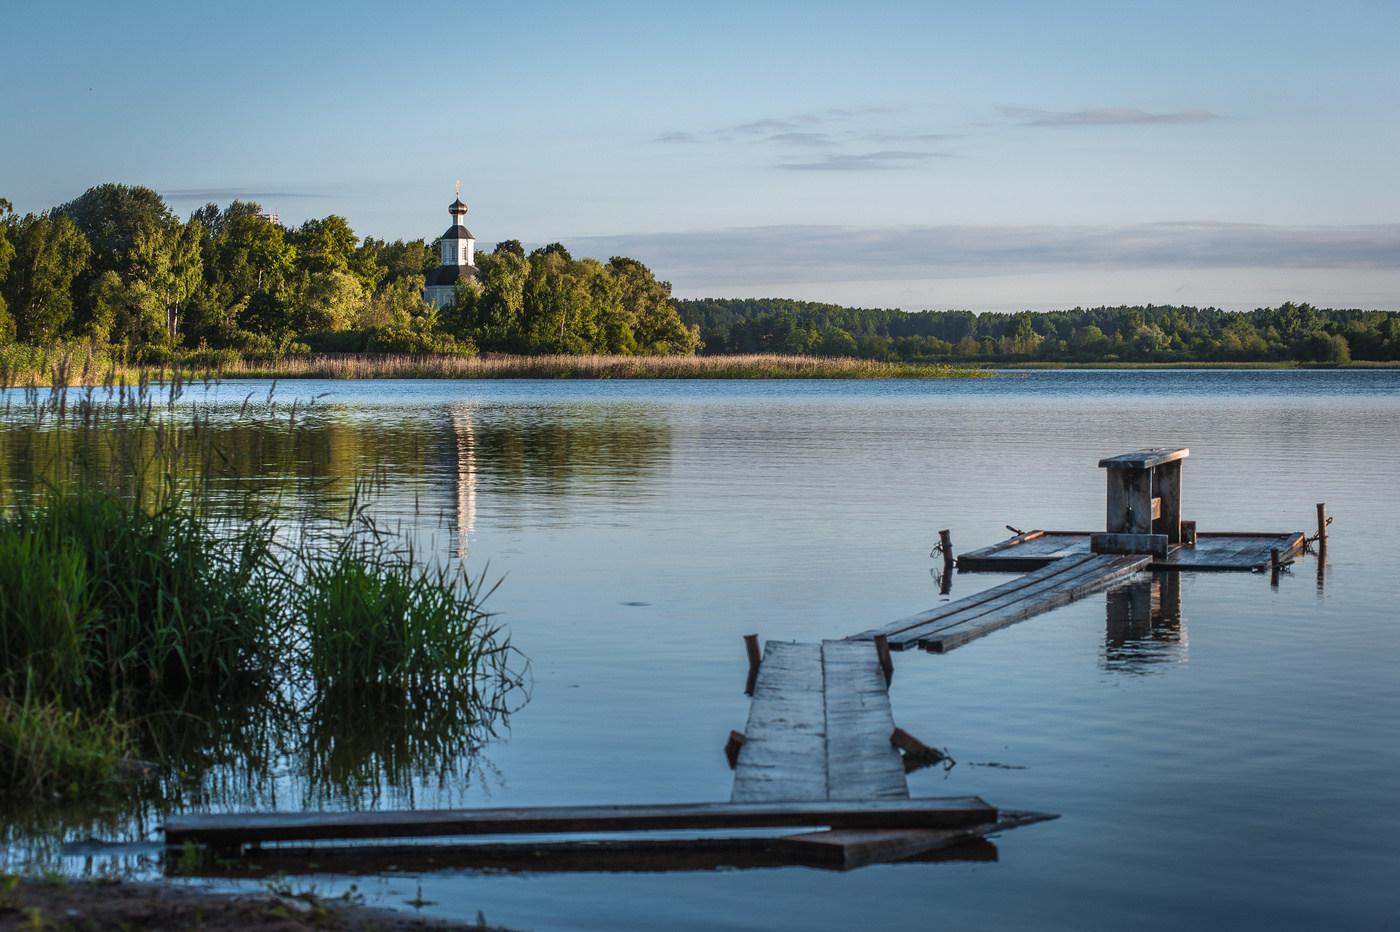 озеро селигер места отдыха фото спину, предложив